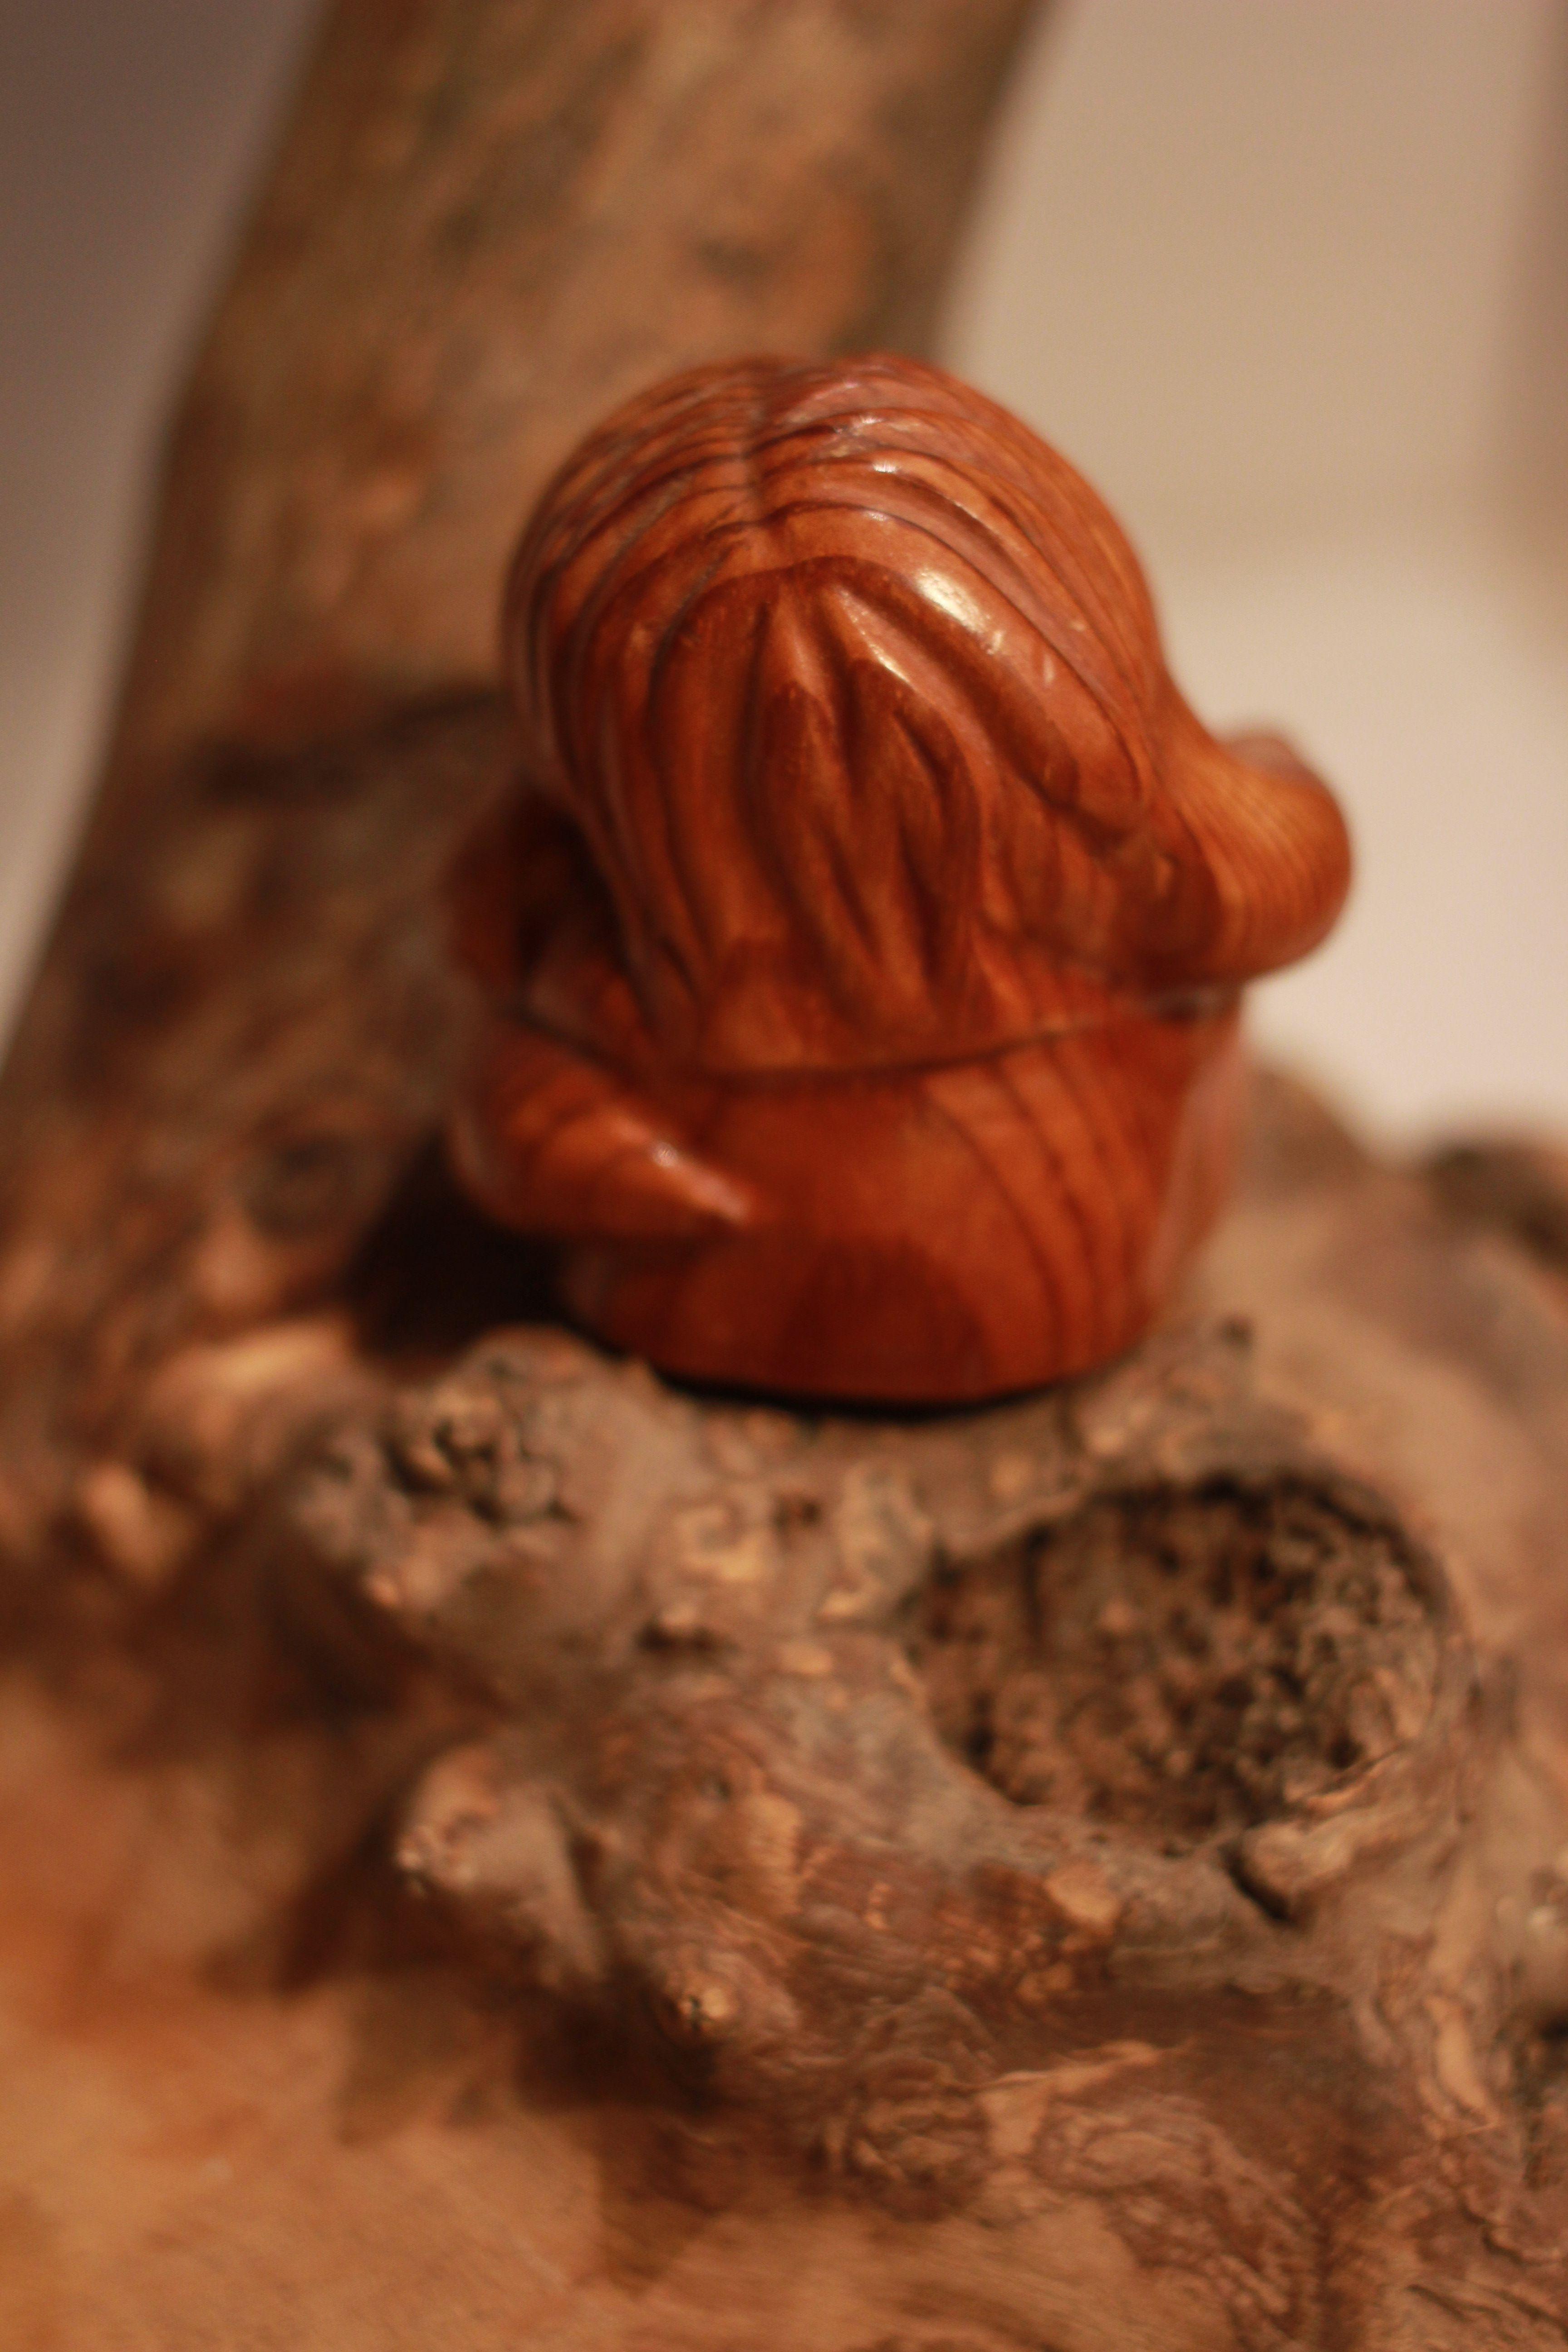 женщинеподарок миниатюрадереворезьба деревунецкэподарокподарок мужчинедля по доманародноефигурка